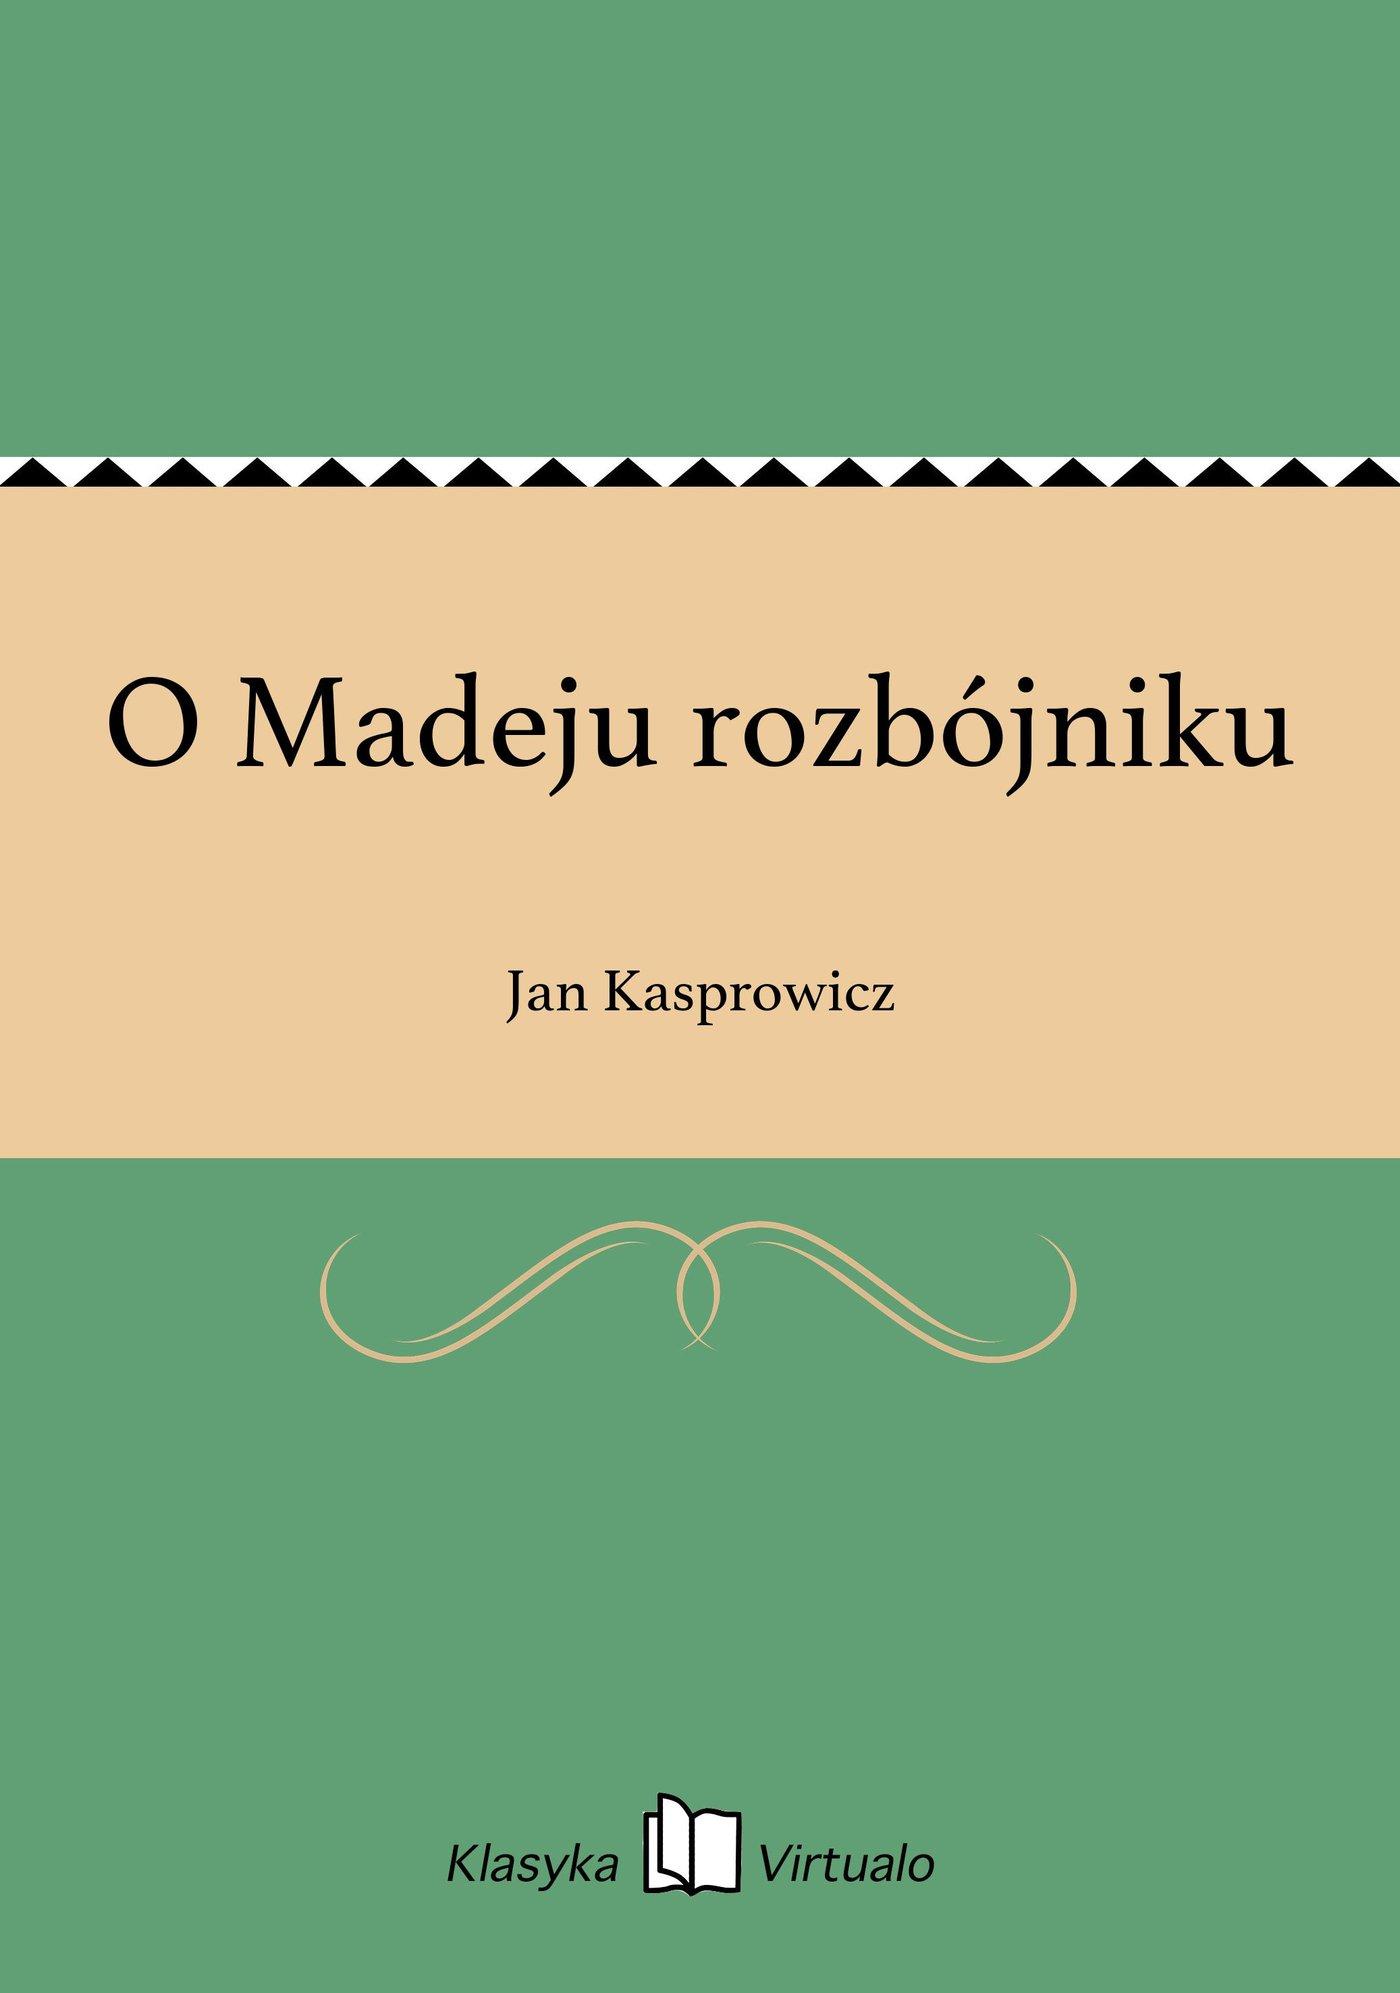 O Madeju rozbójniku - Ebook (Książka na Kindle) do pobrania w formacie MOBI